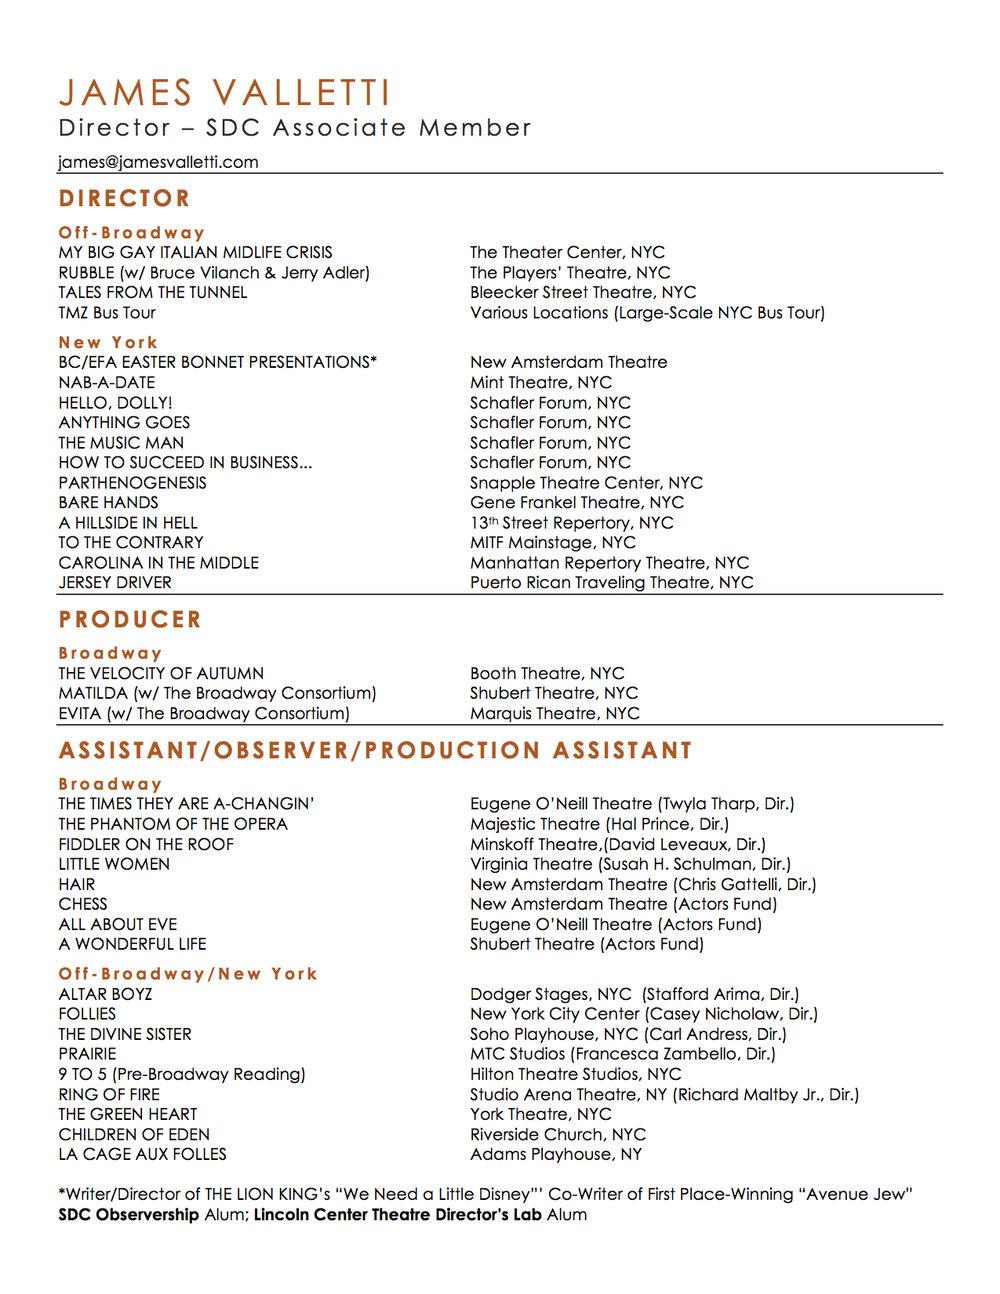 Valletti Directing Resume WEB 2016.jpg